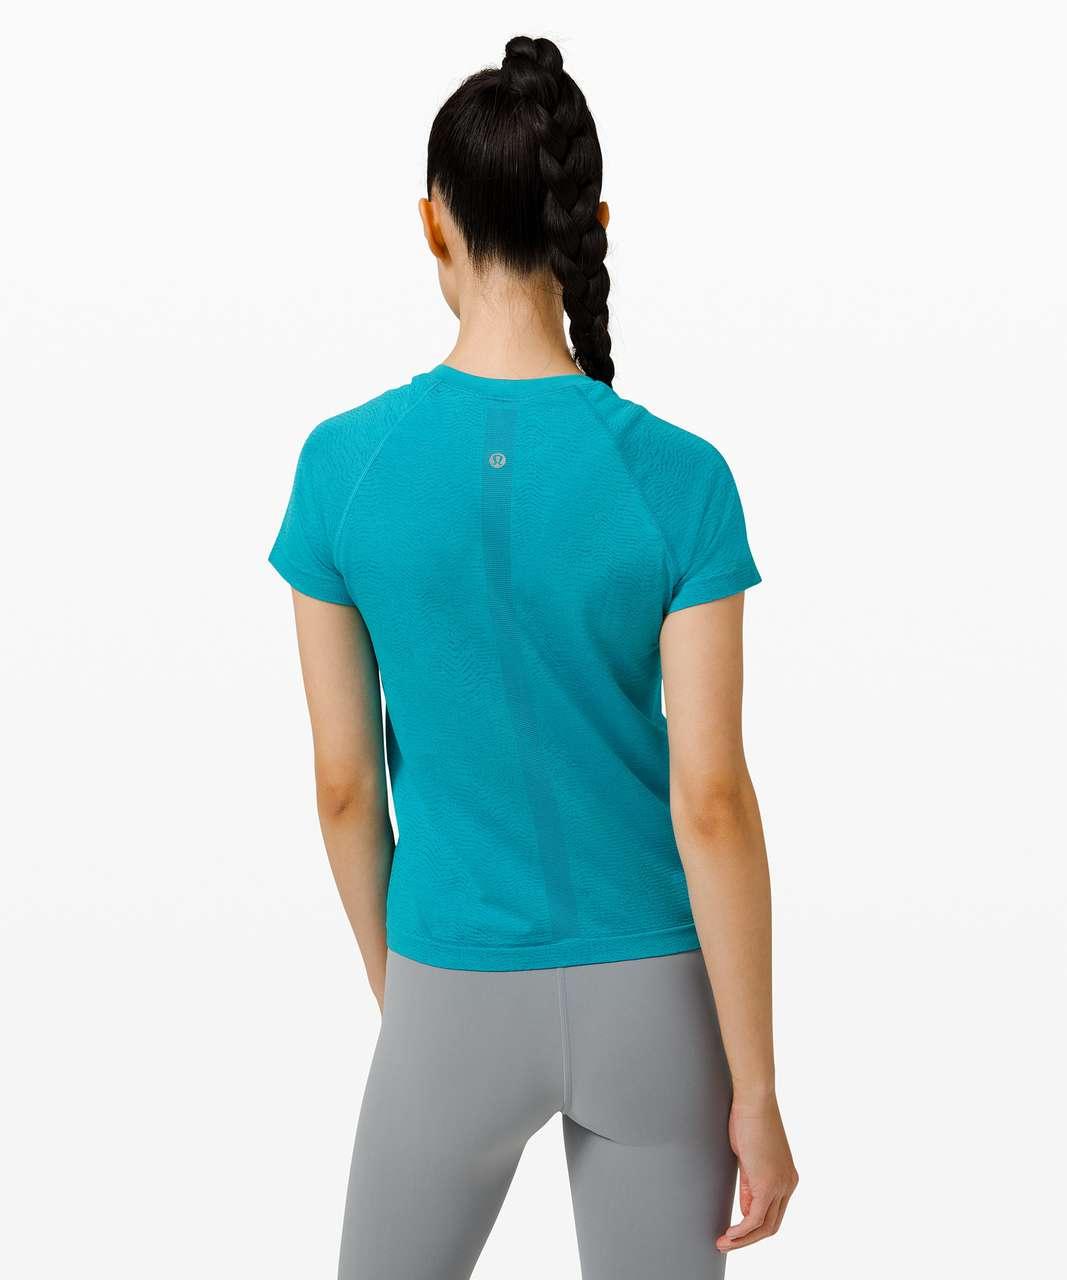 Lululemon Swiftly Tech Short Sleeve 2.0 *Race Length - Ripple Wave Hawaiian Blue / Turquoise Tide